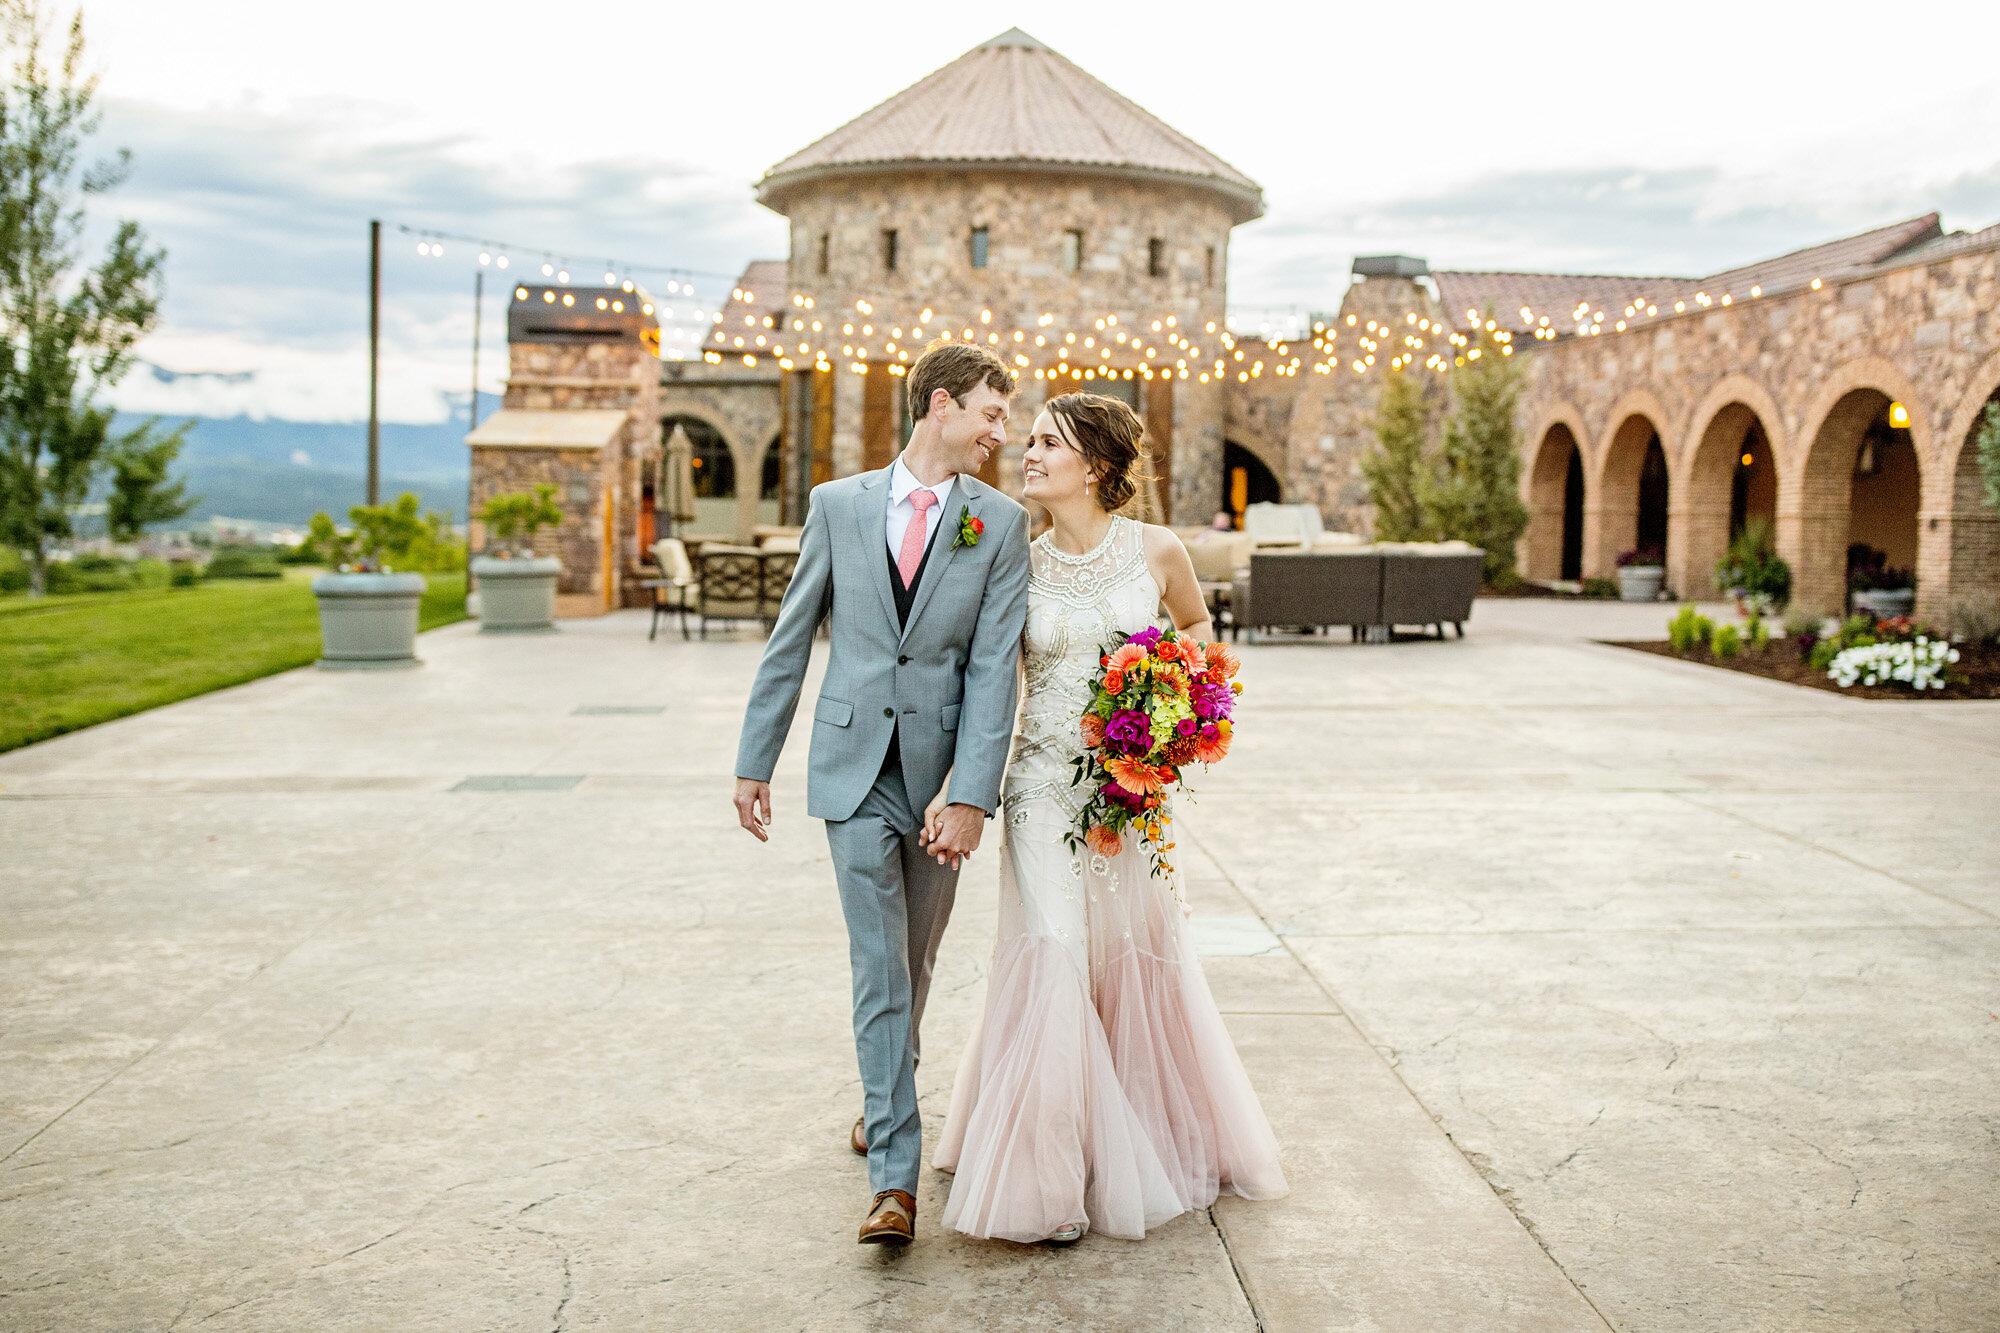 Seriously_Sabrina_Photography_Colorado_Springs_Club_at_Flying_Horse_Destination_Wedding_ODwyer84.jpg